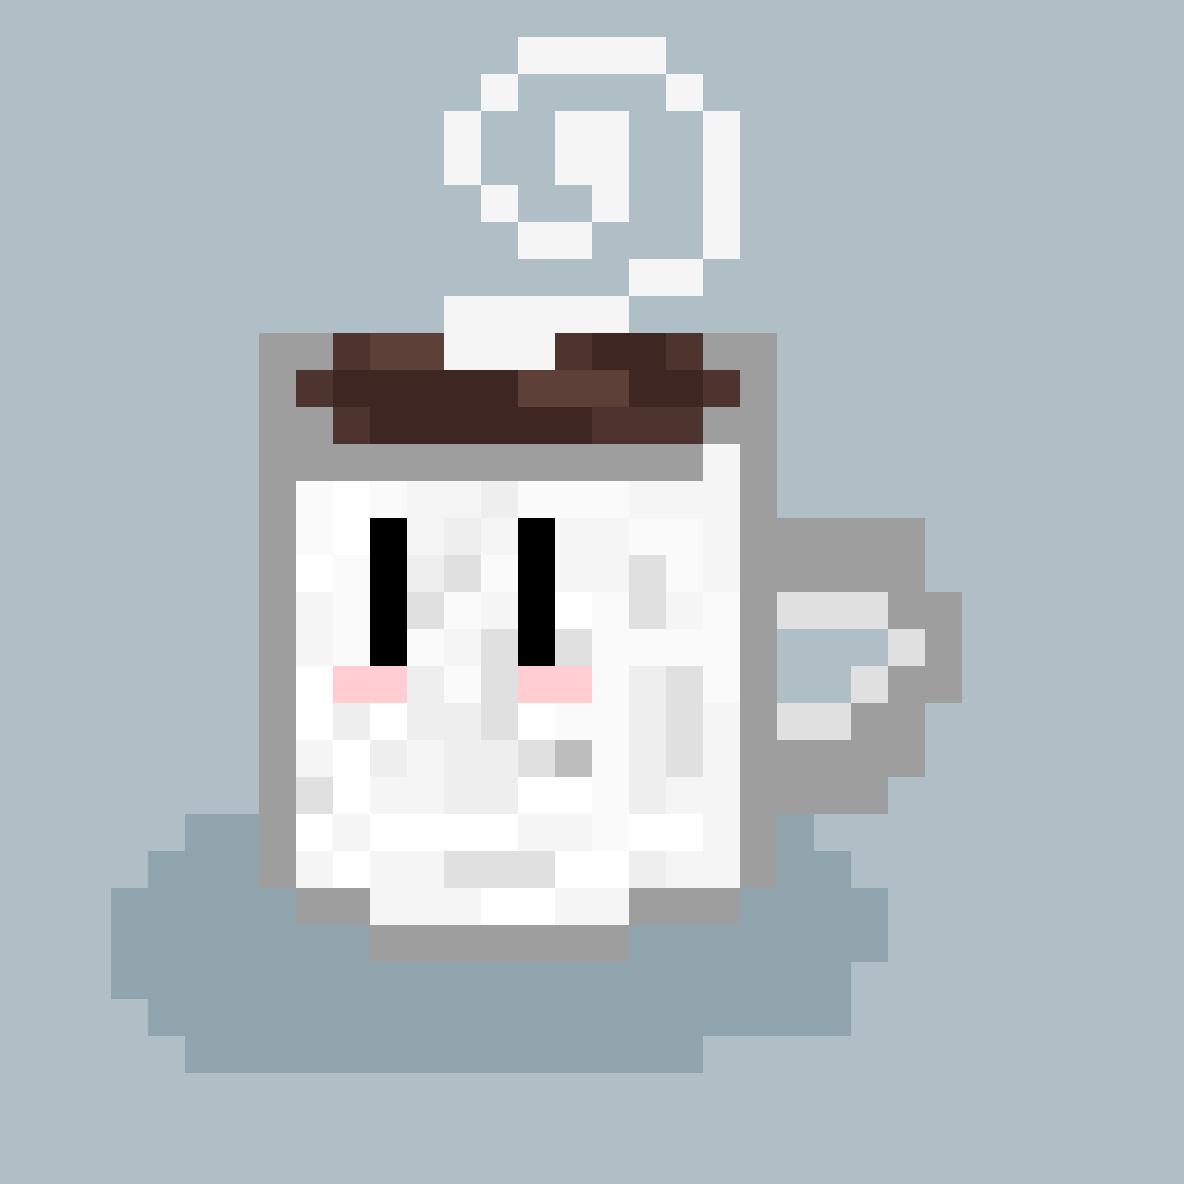 Cocoa Cup by NovaArtist